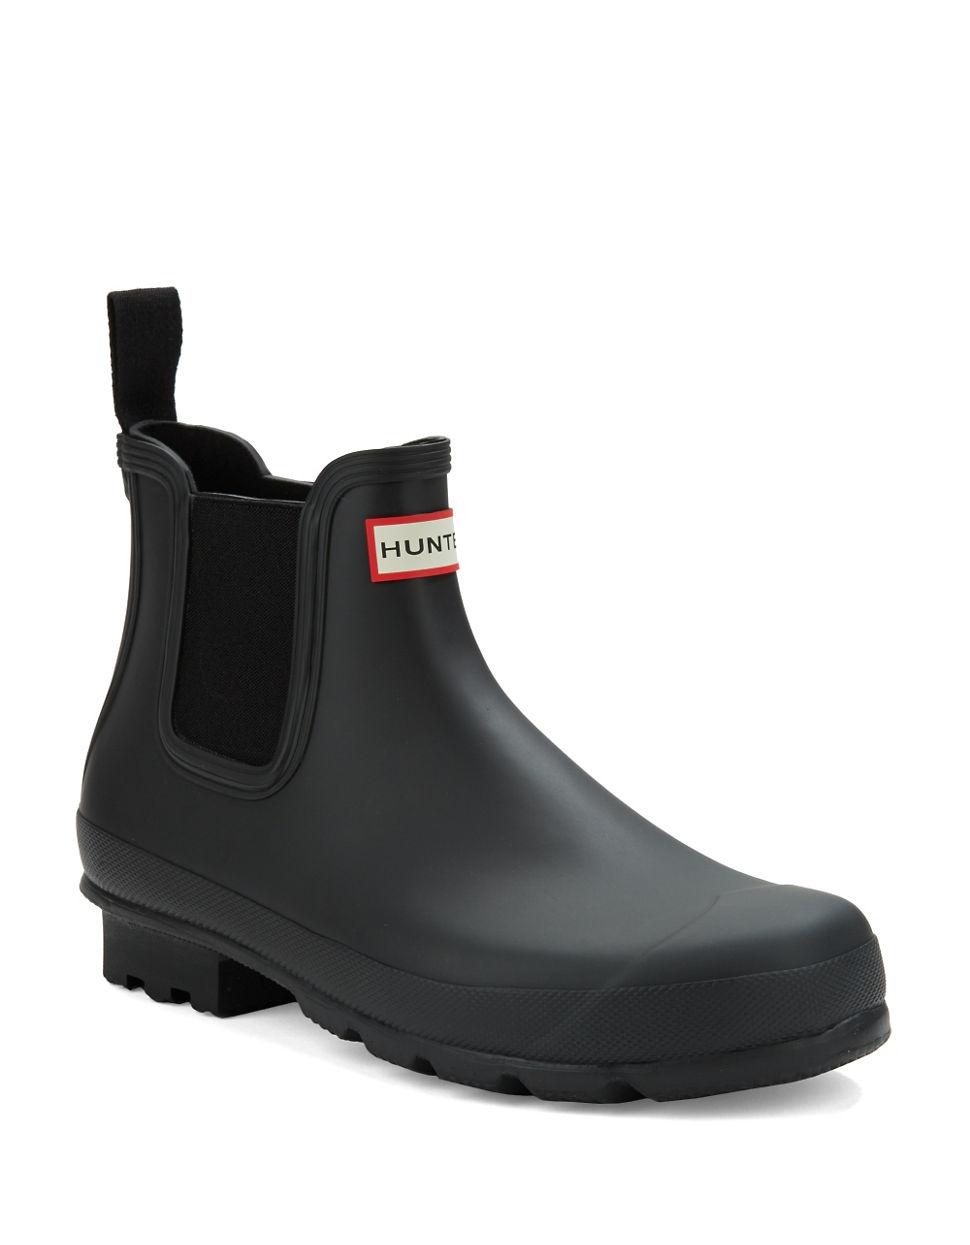 hunter chelsea rain ankle boots in black for men lyst. Black Bedroom Furniture Sets. Home Design Ideas